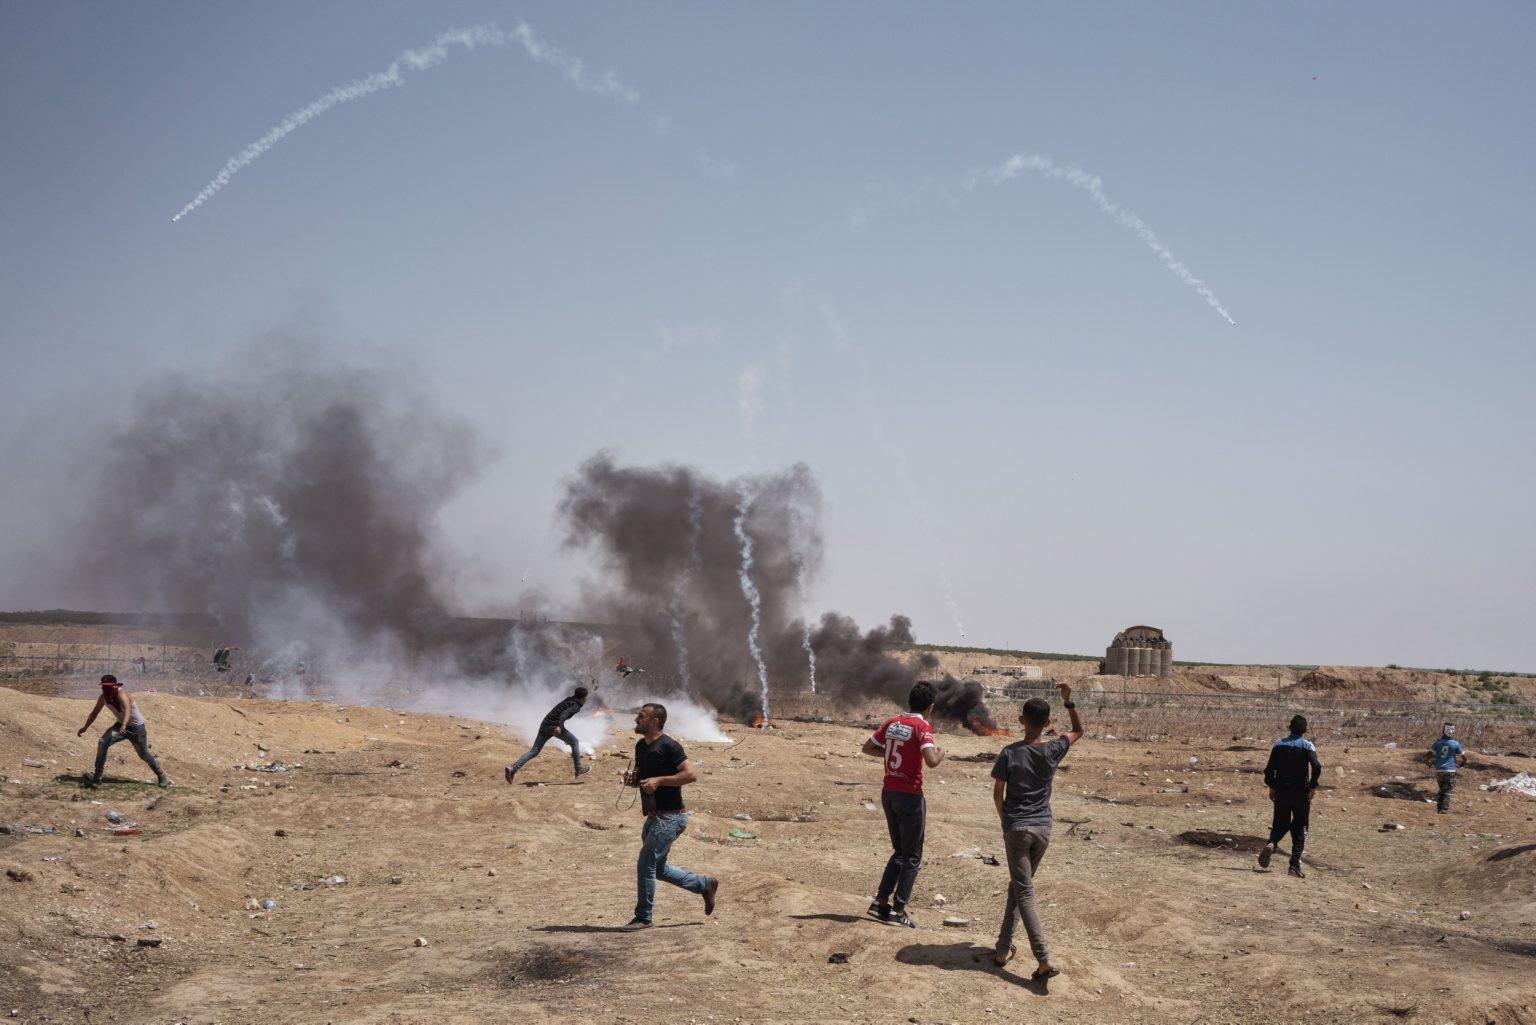 Gaza Strip, May 2018 - Tear gas are fired at Palestinian demonstrators by Israeli forces. >< Striscia di Gaza, maggio 2018 - Soldati israeliani lanciano gas lacrimogeni verdo i manifestanti palestinesi.